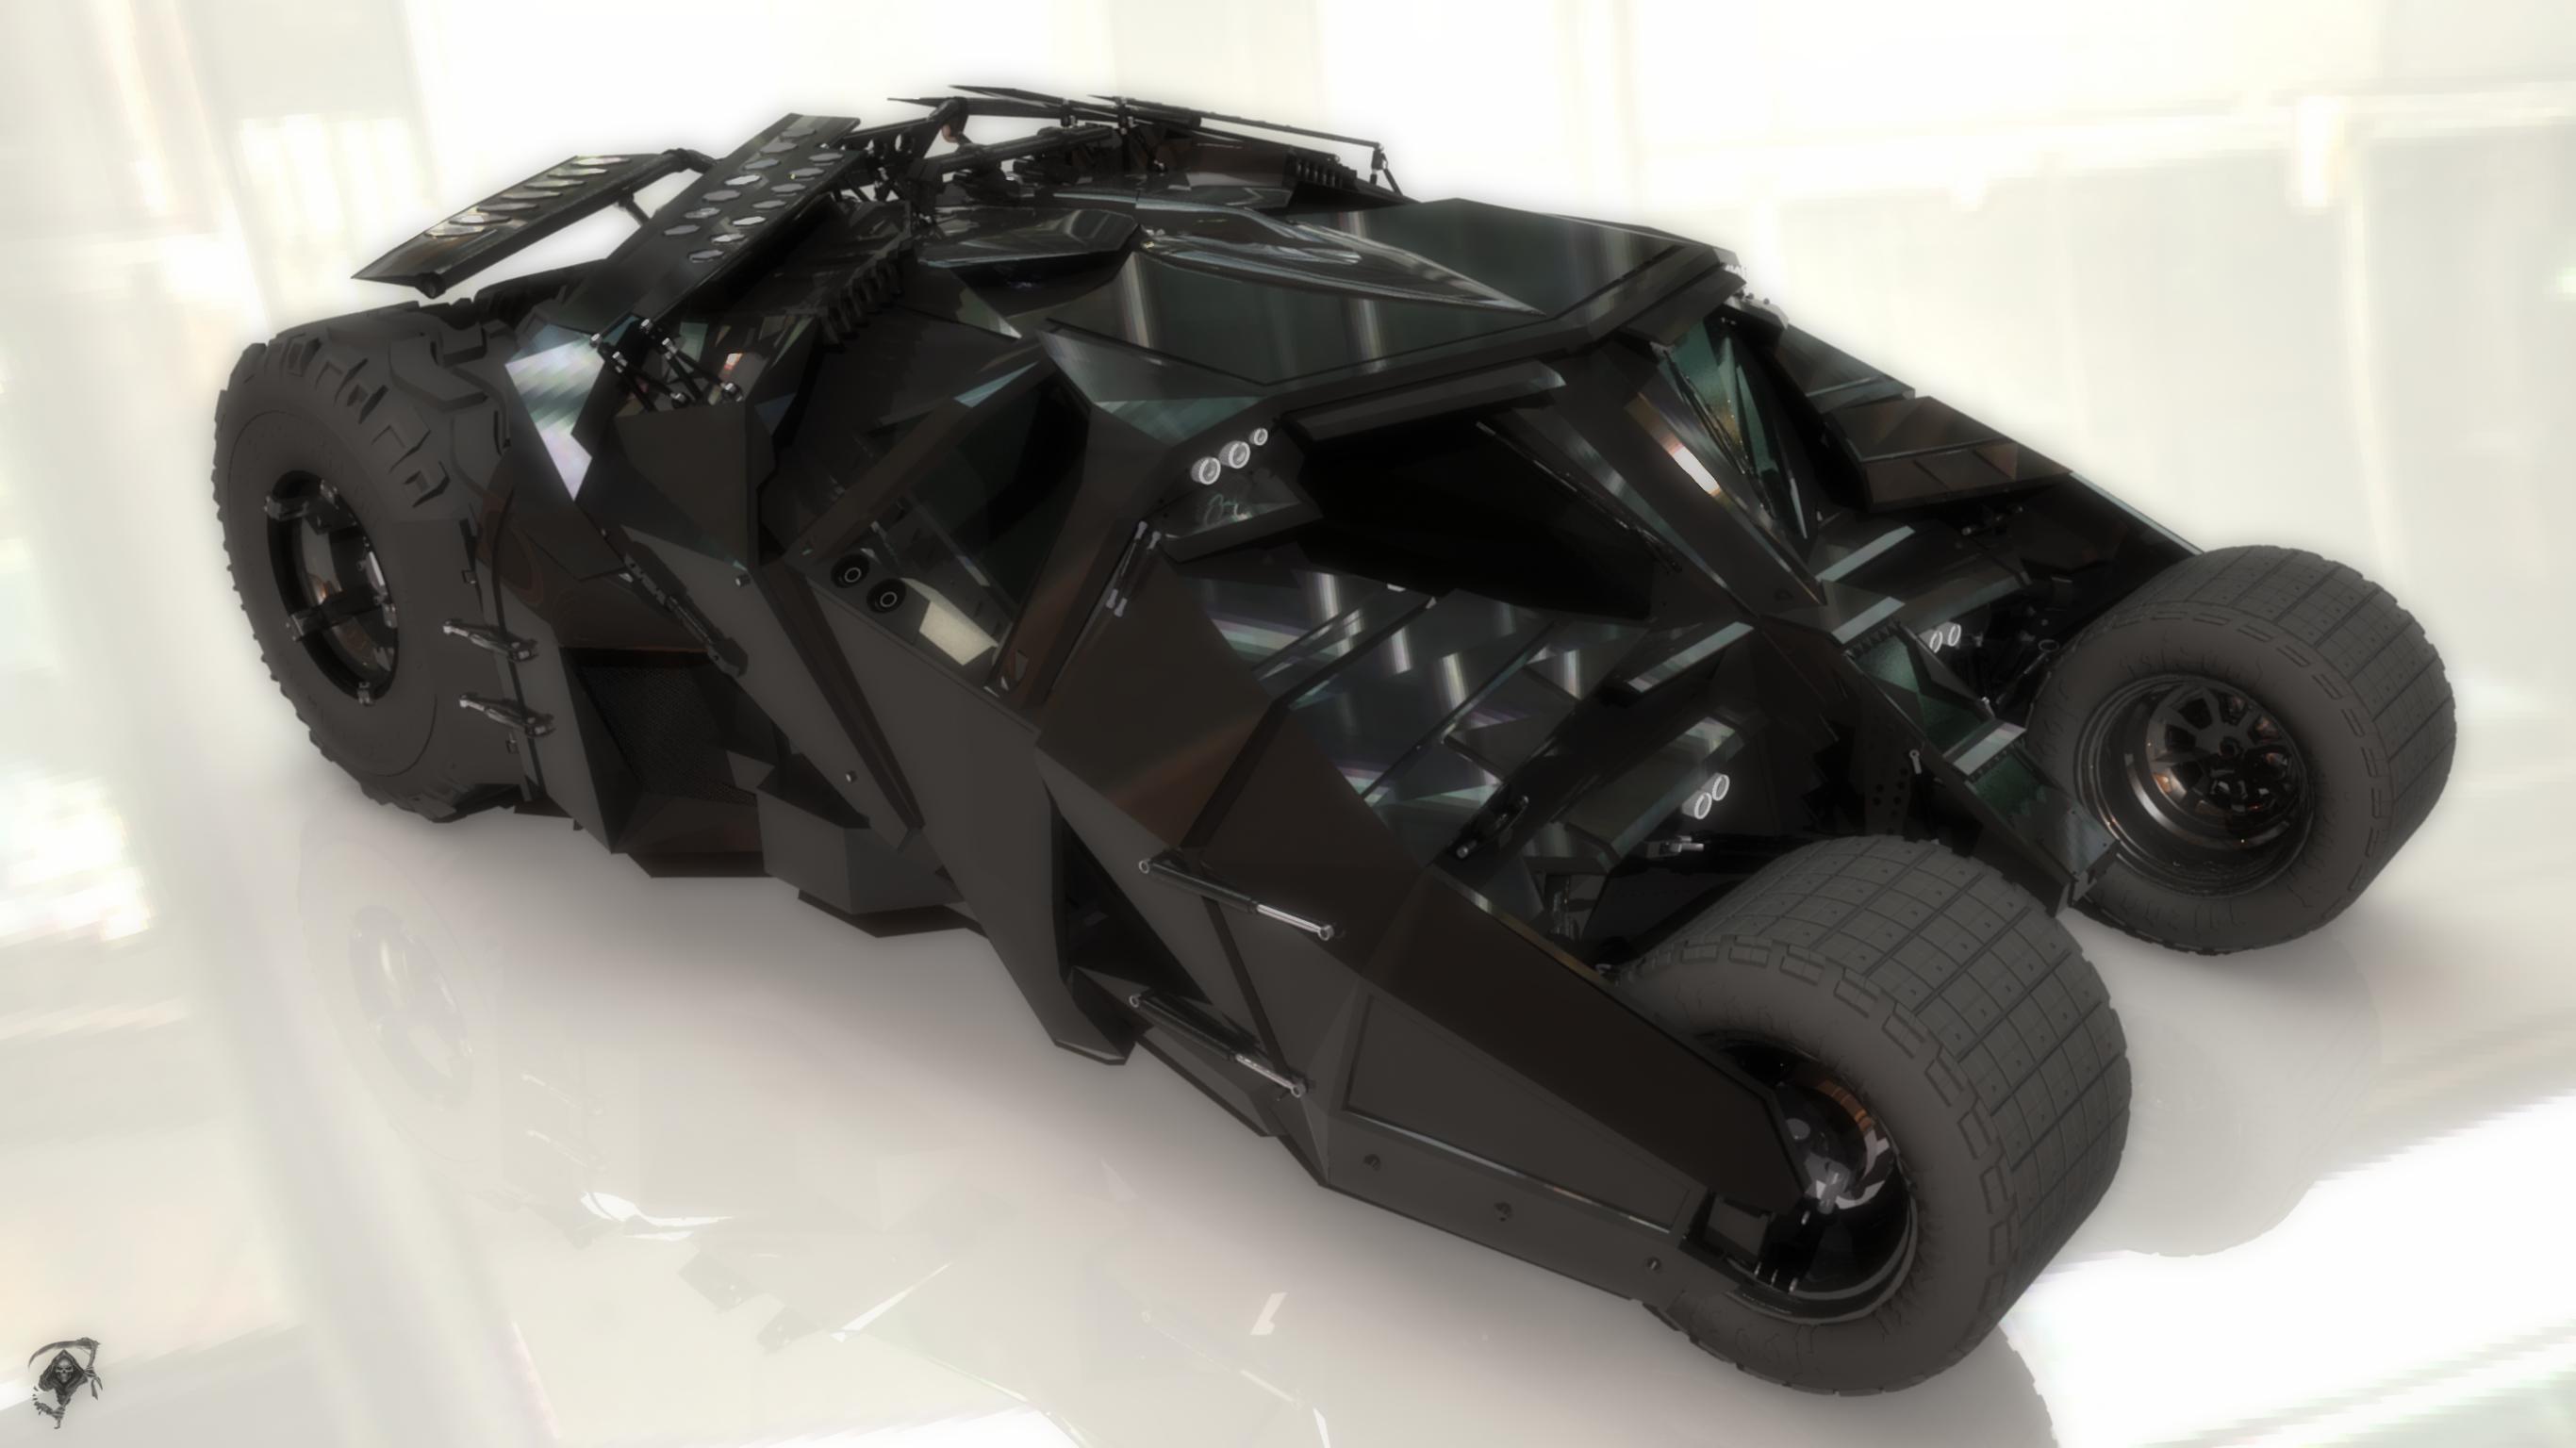 ..It's a black tank by karanua